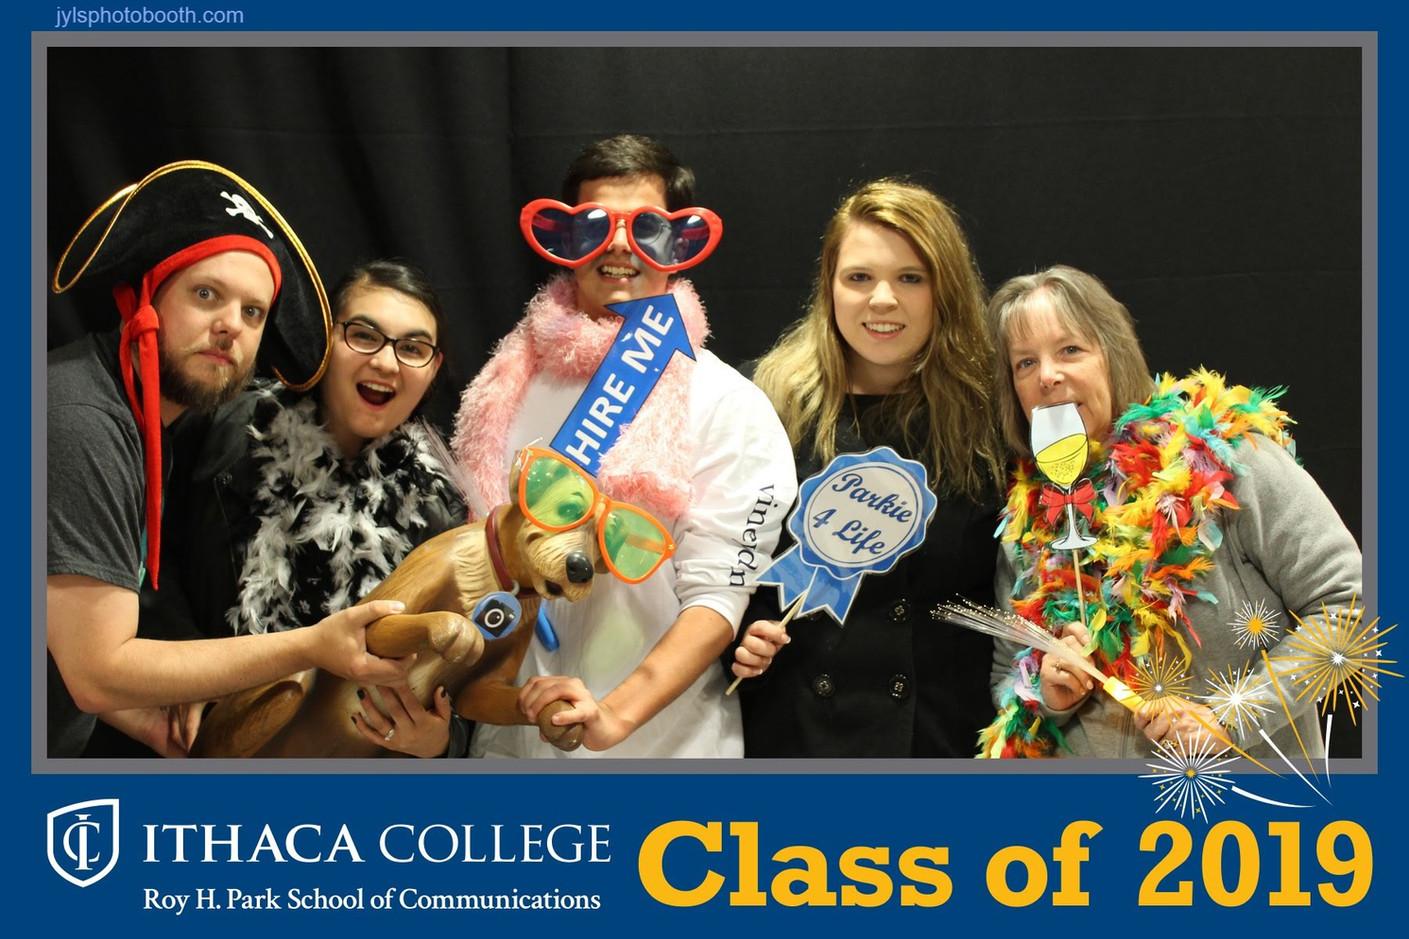 ithaca-college-park-school_40916549413_o